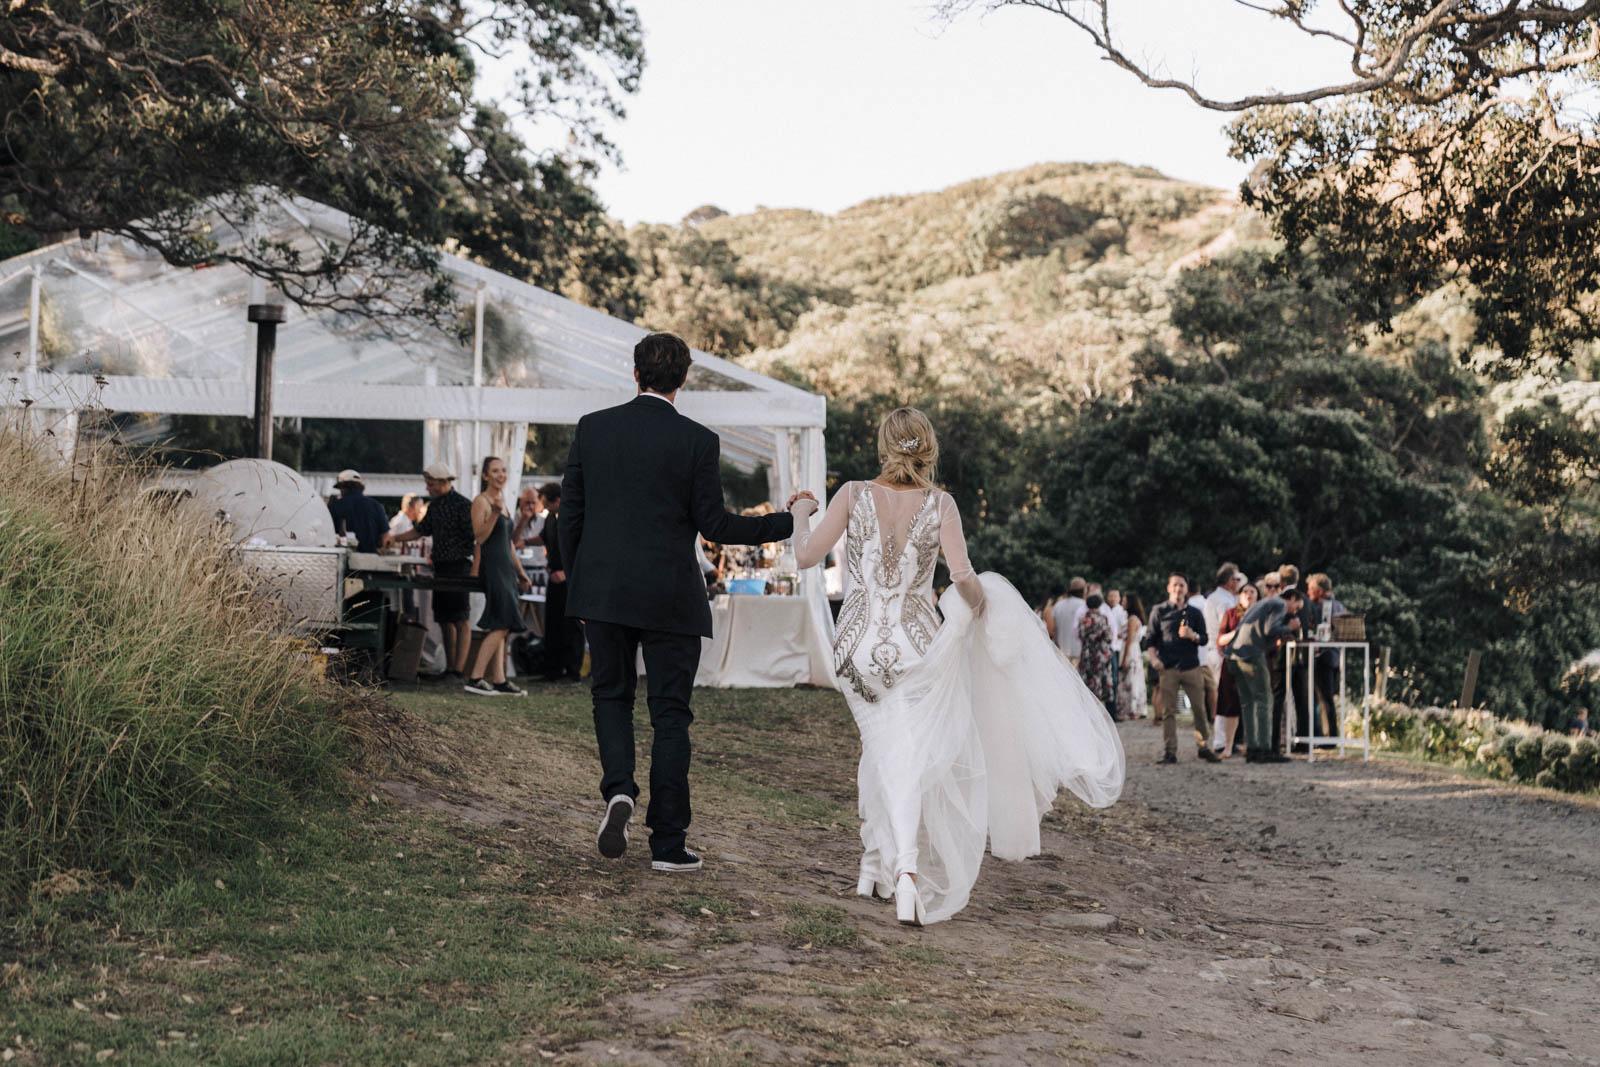 newfound-l-i-coromandel-wedding-photographer-1825-A9_04626